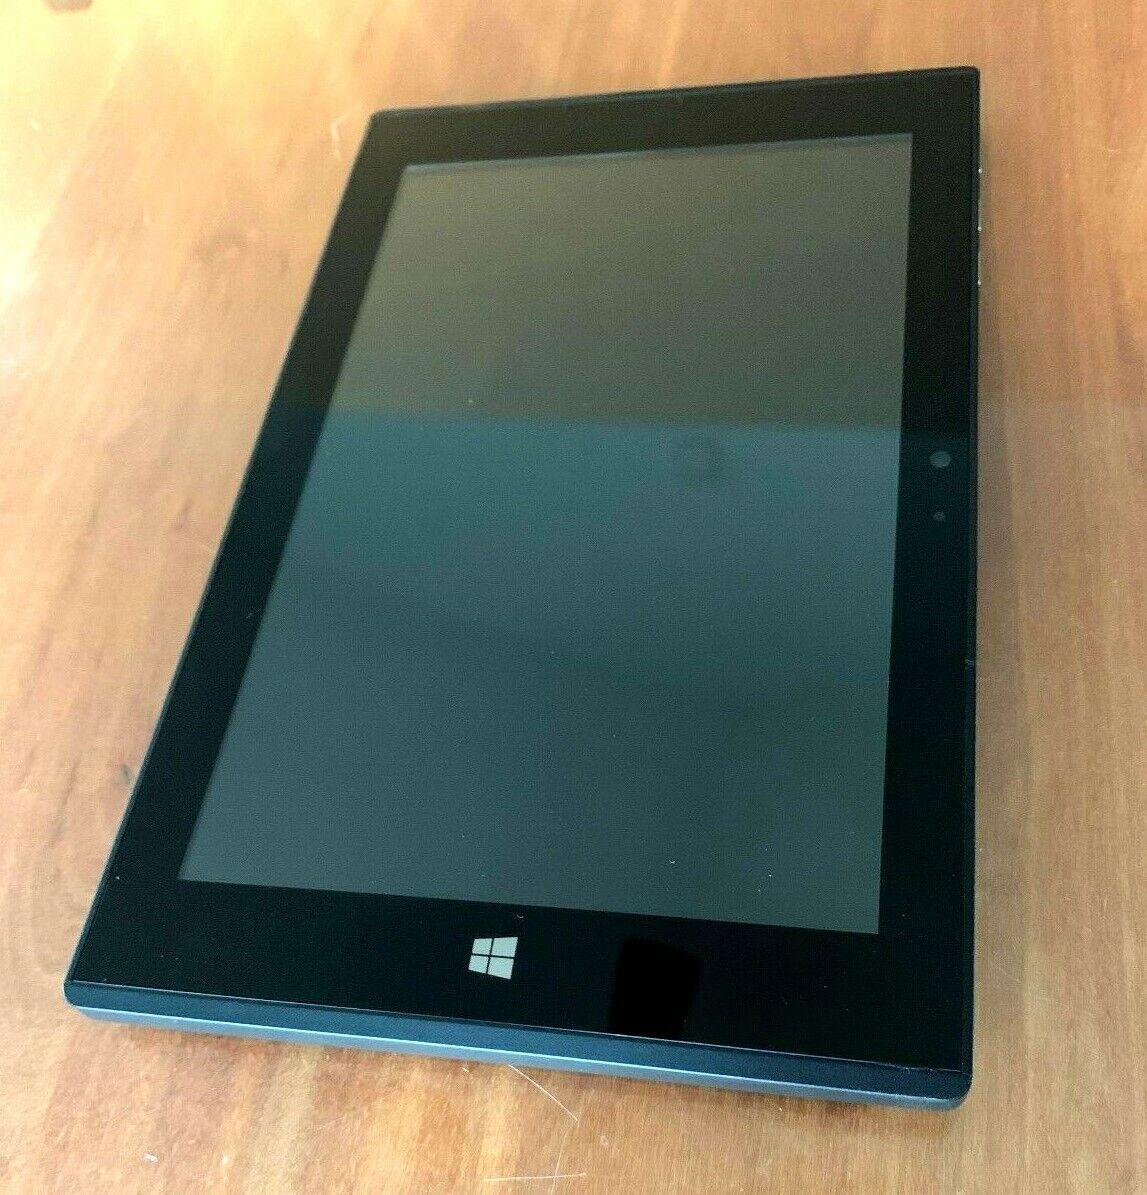 "8"" Windows 10 Home tablet computer NIB; dual USB ports"